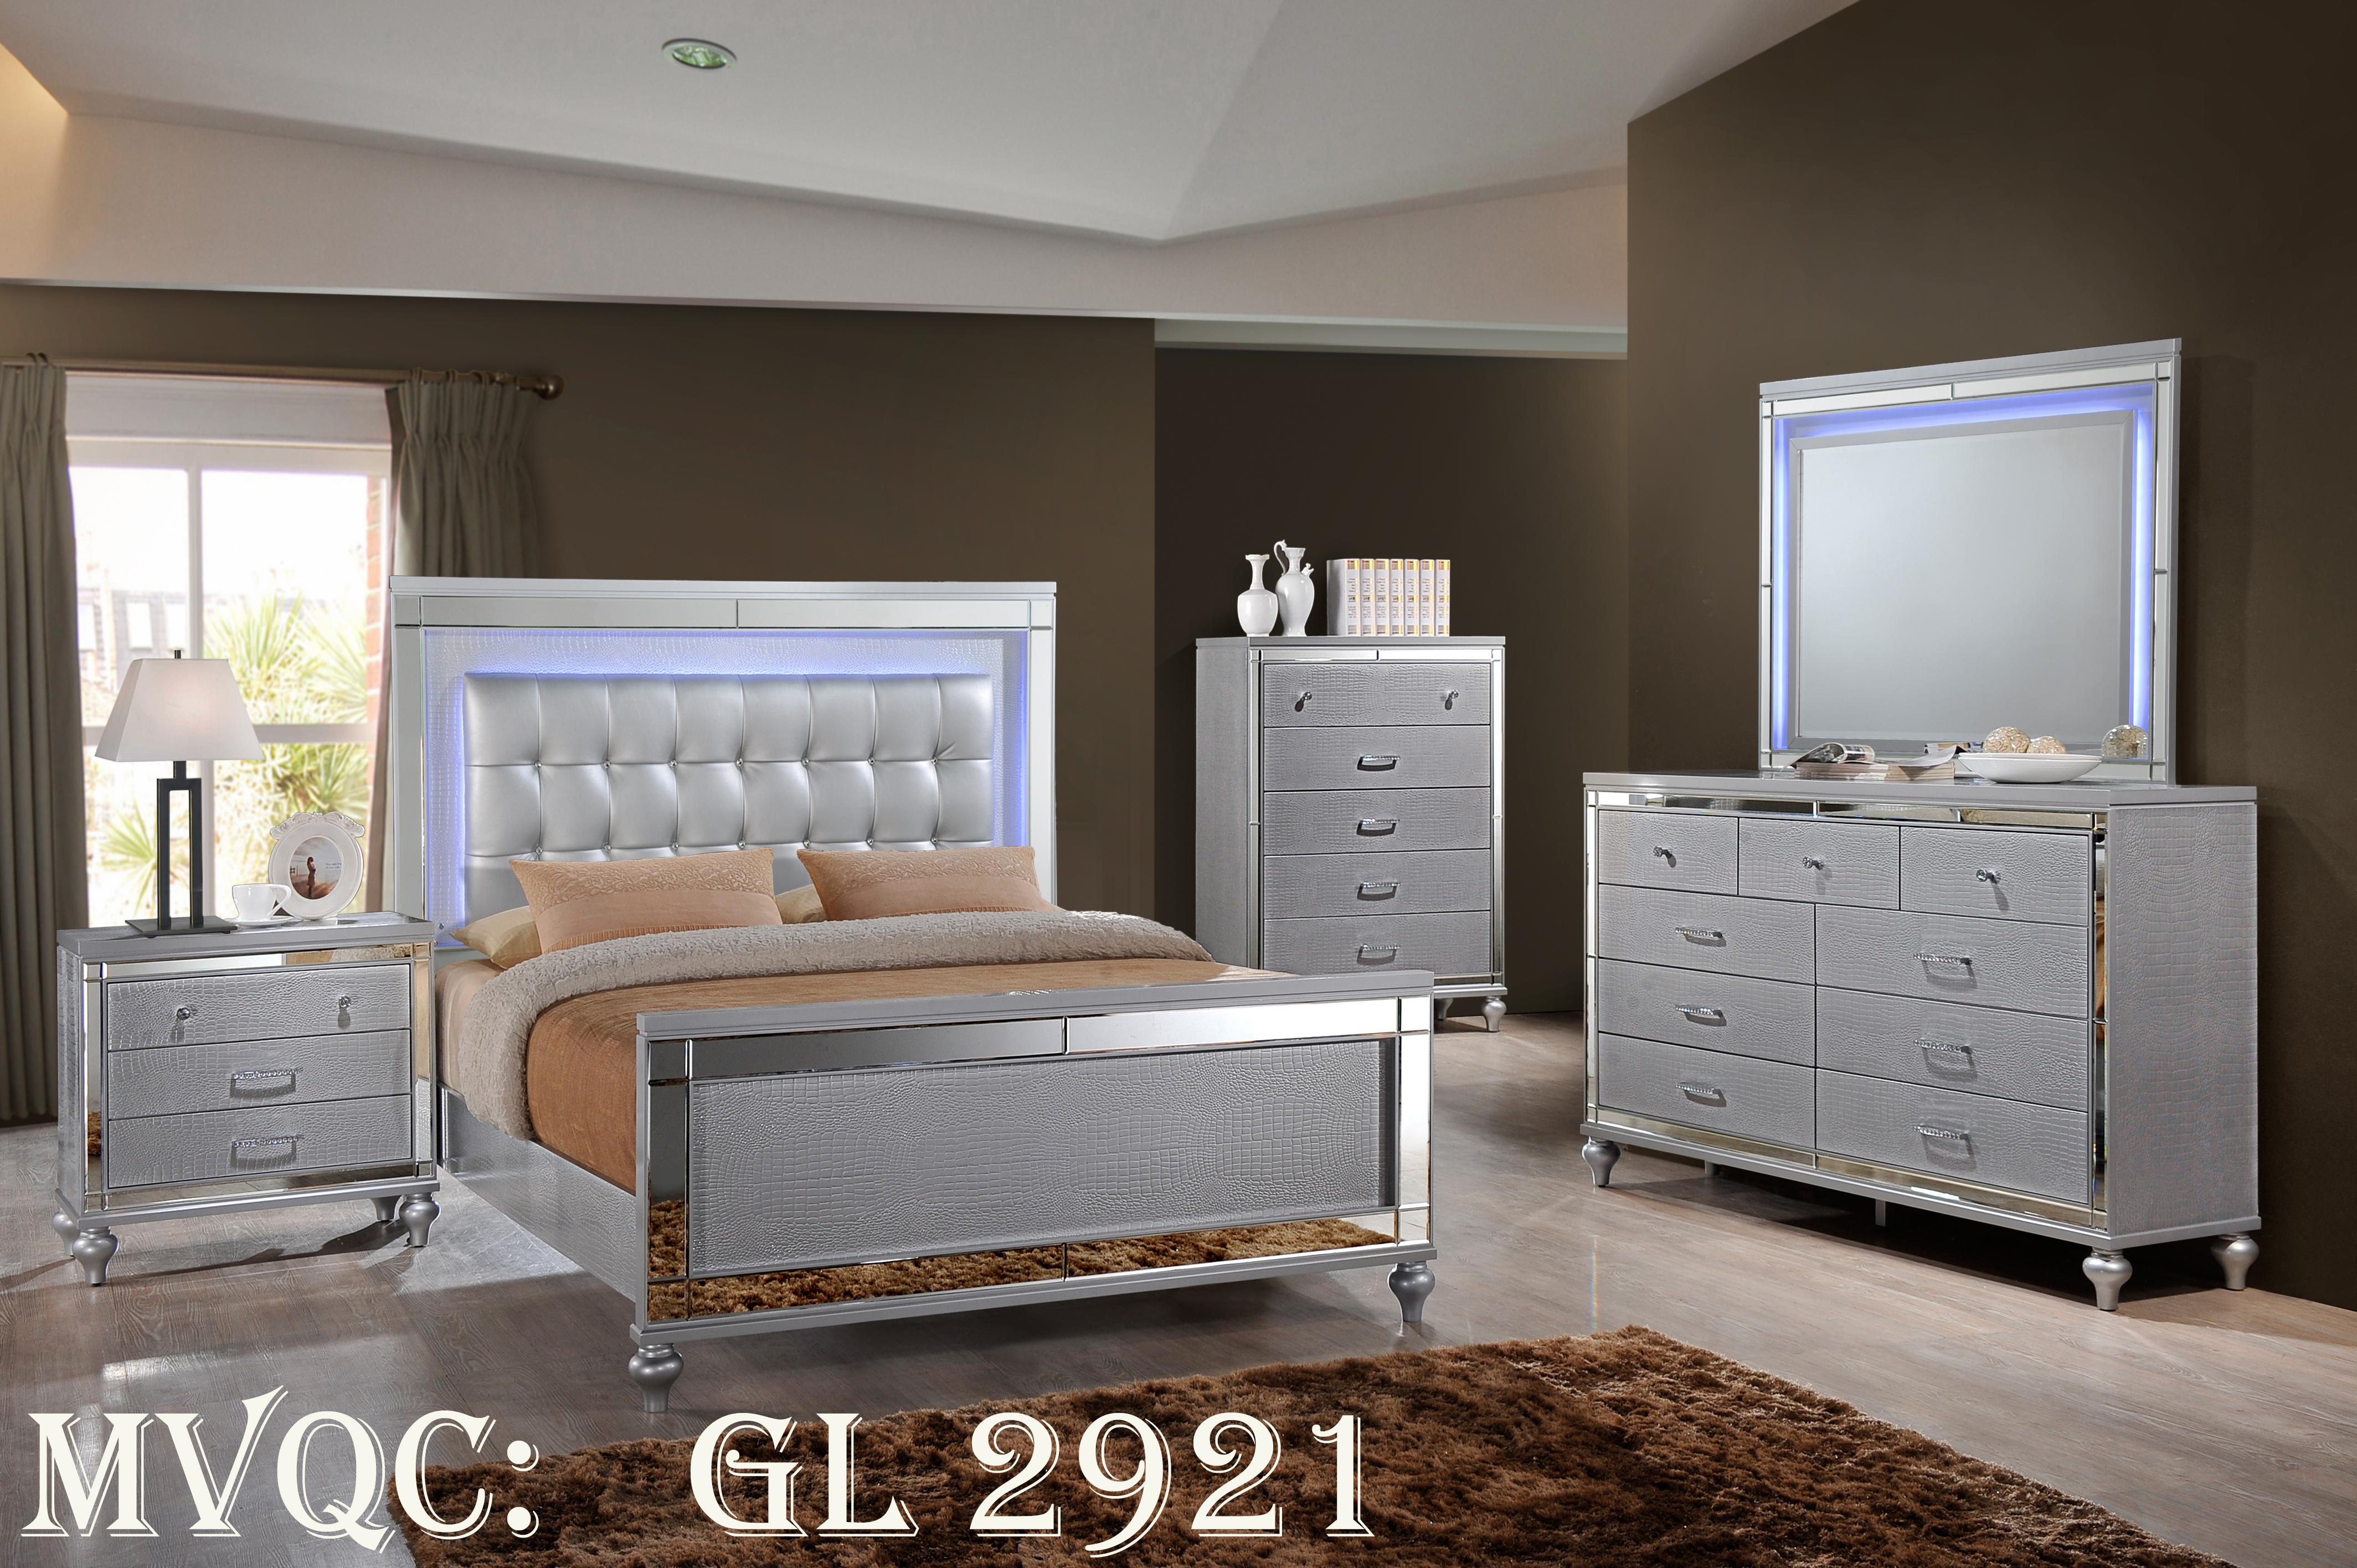 GL 2921